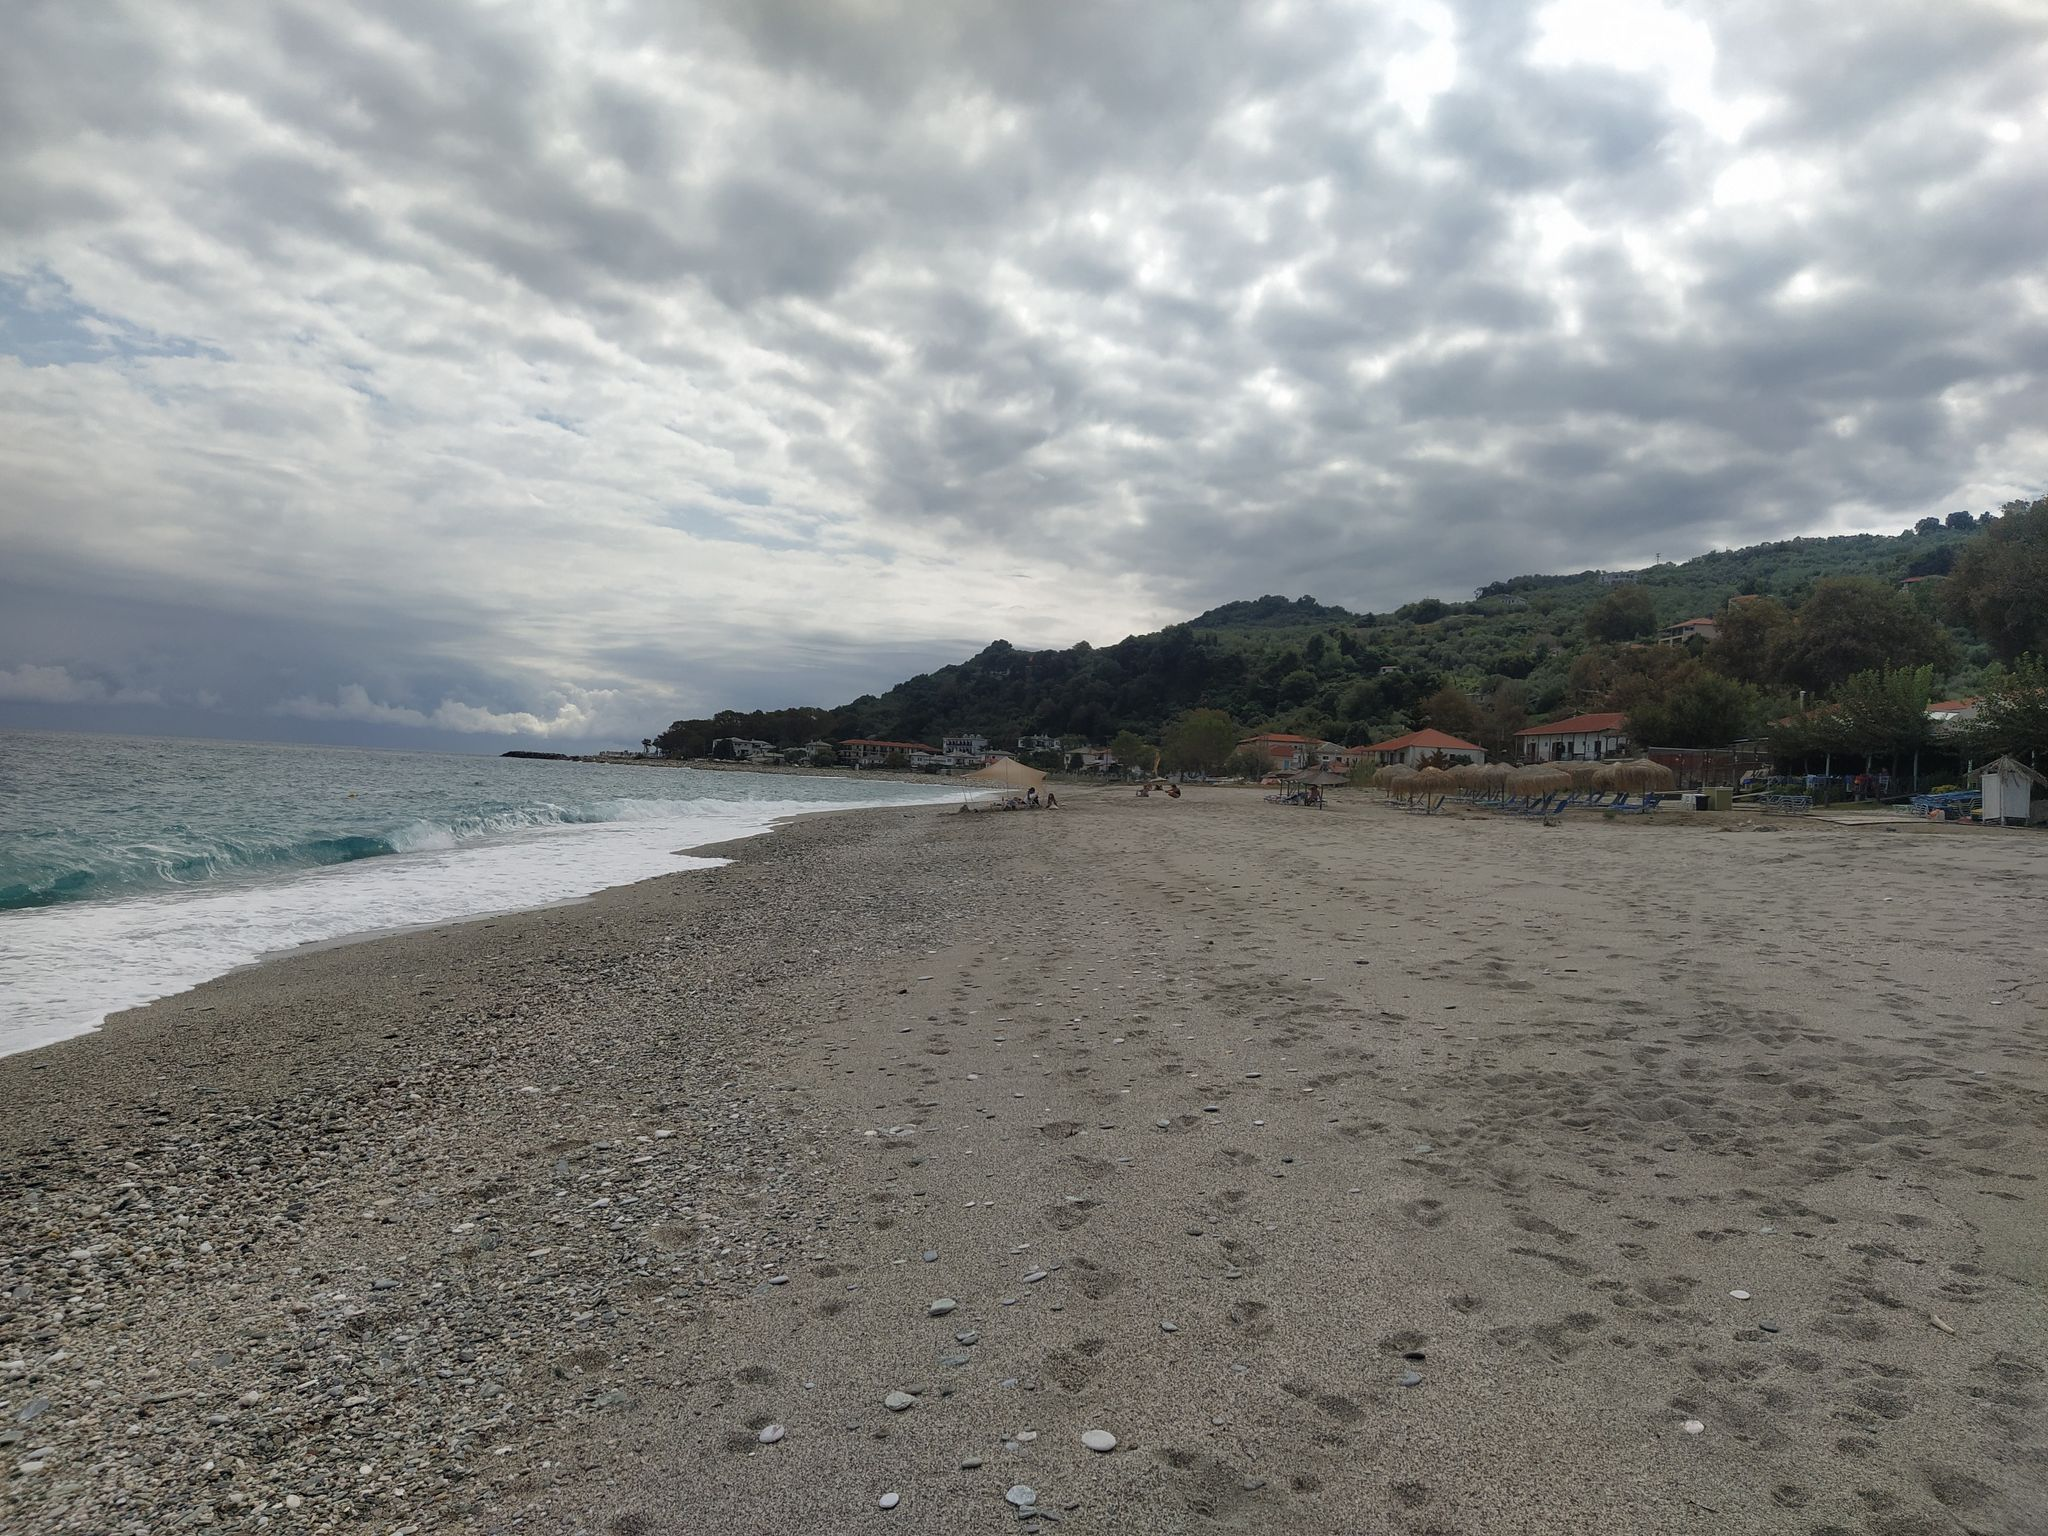 пясъчен плаж Хоревто, Пилио